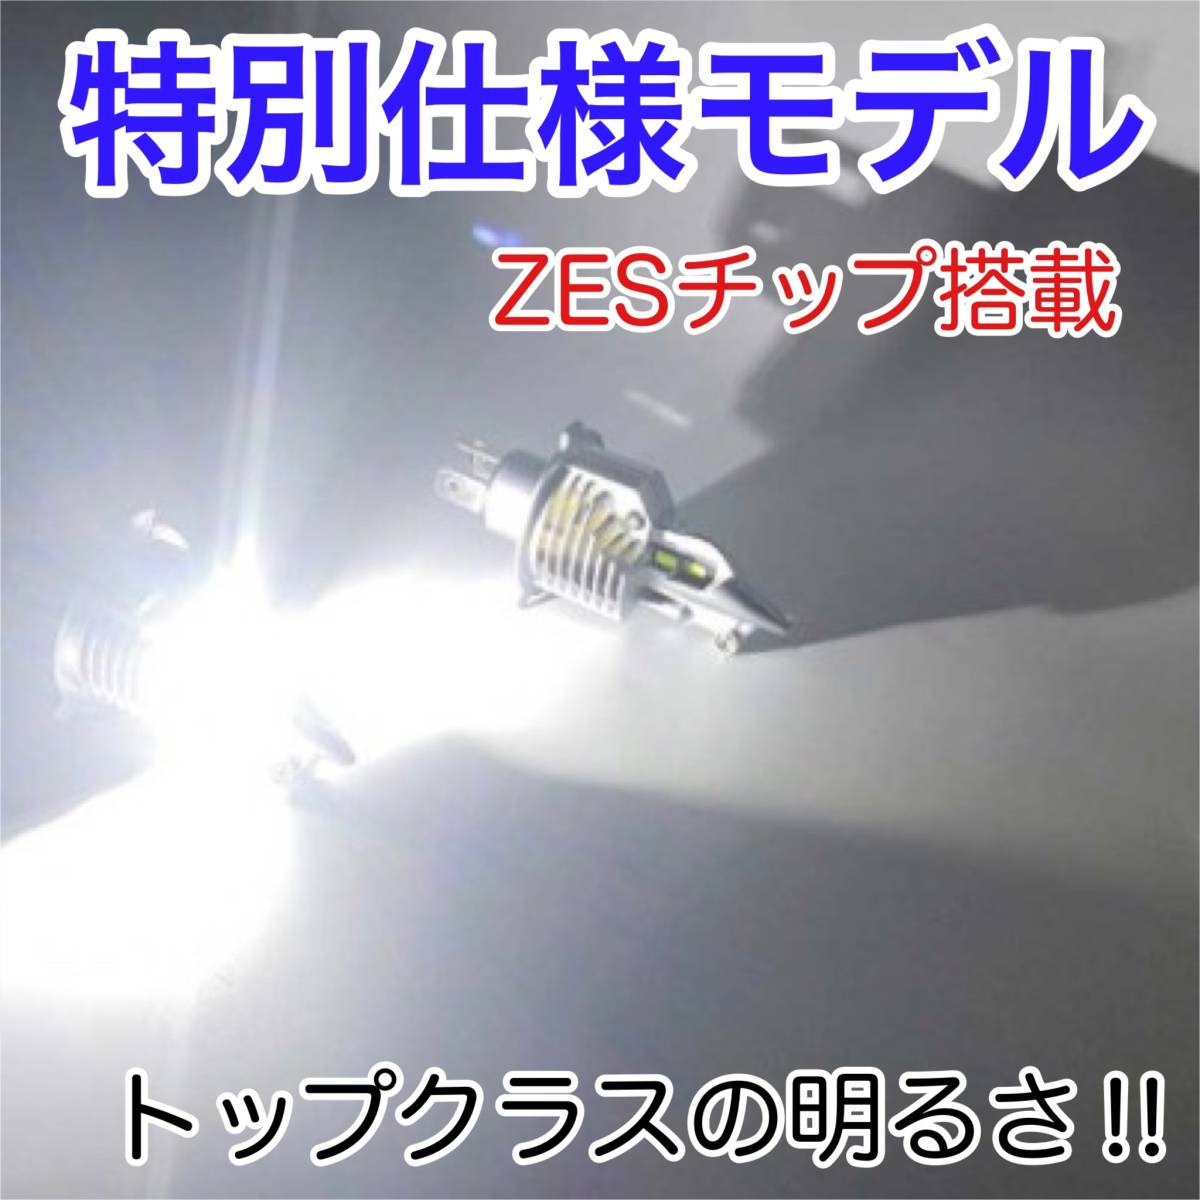 YAMAHA ヤマハ マジェスティ125FI SE06 LED H4 LEDヘッドライト Hi/Lo バルブ バイク用 1灯 ホワイト 交換用_画像2